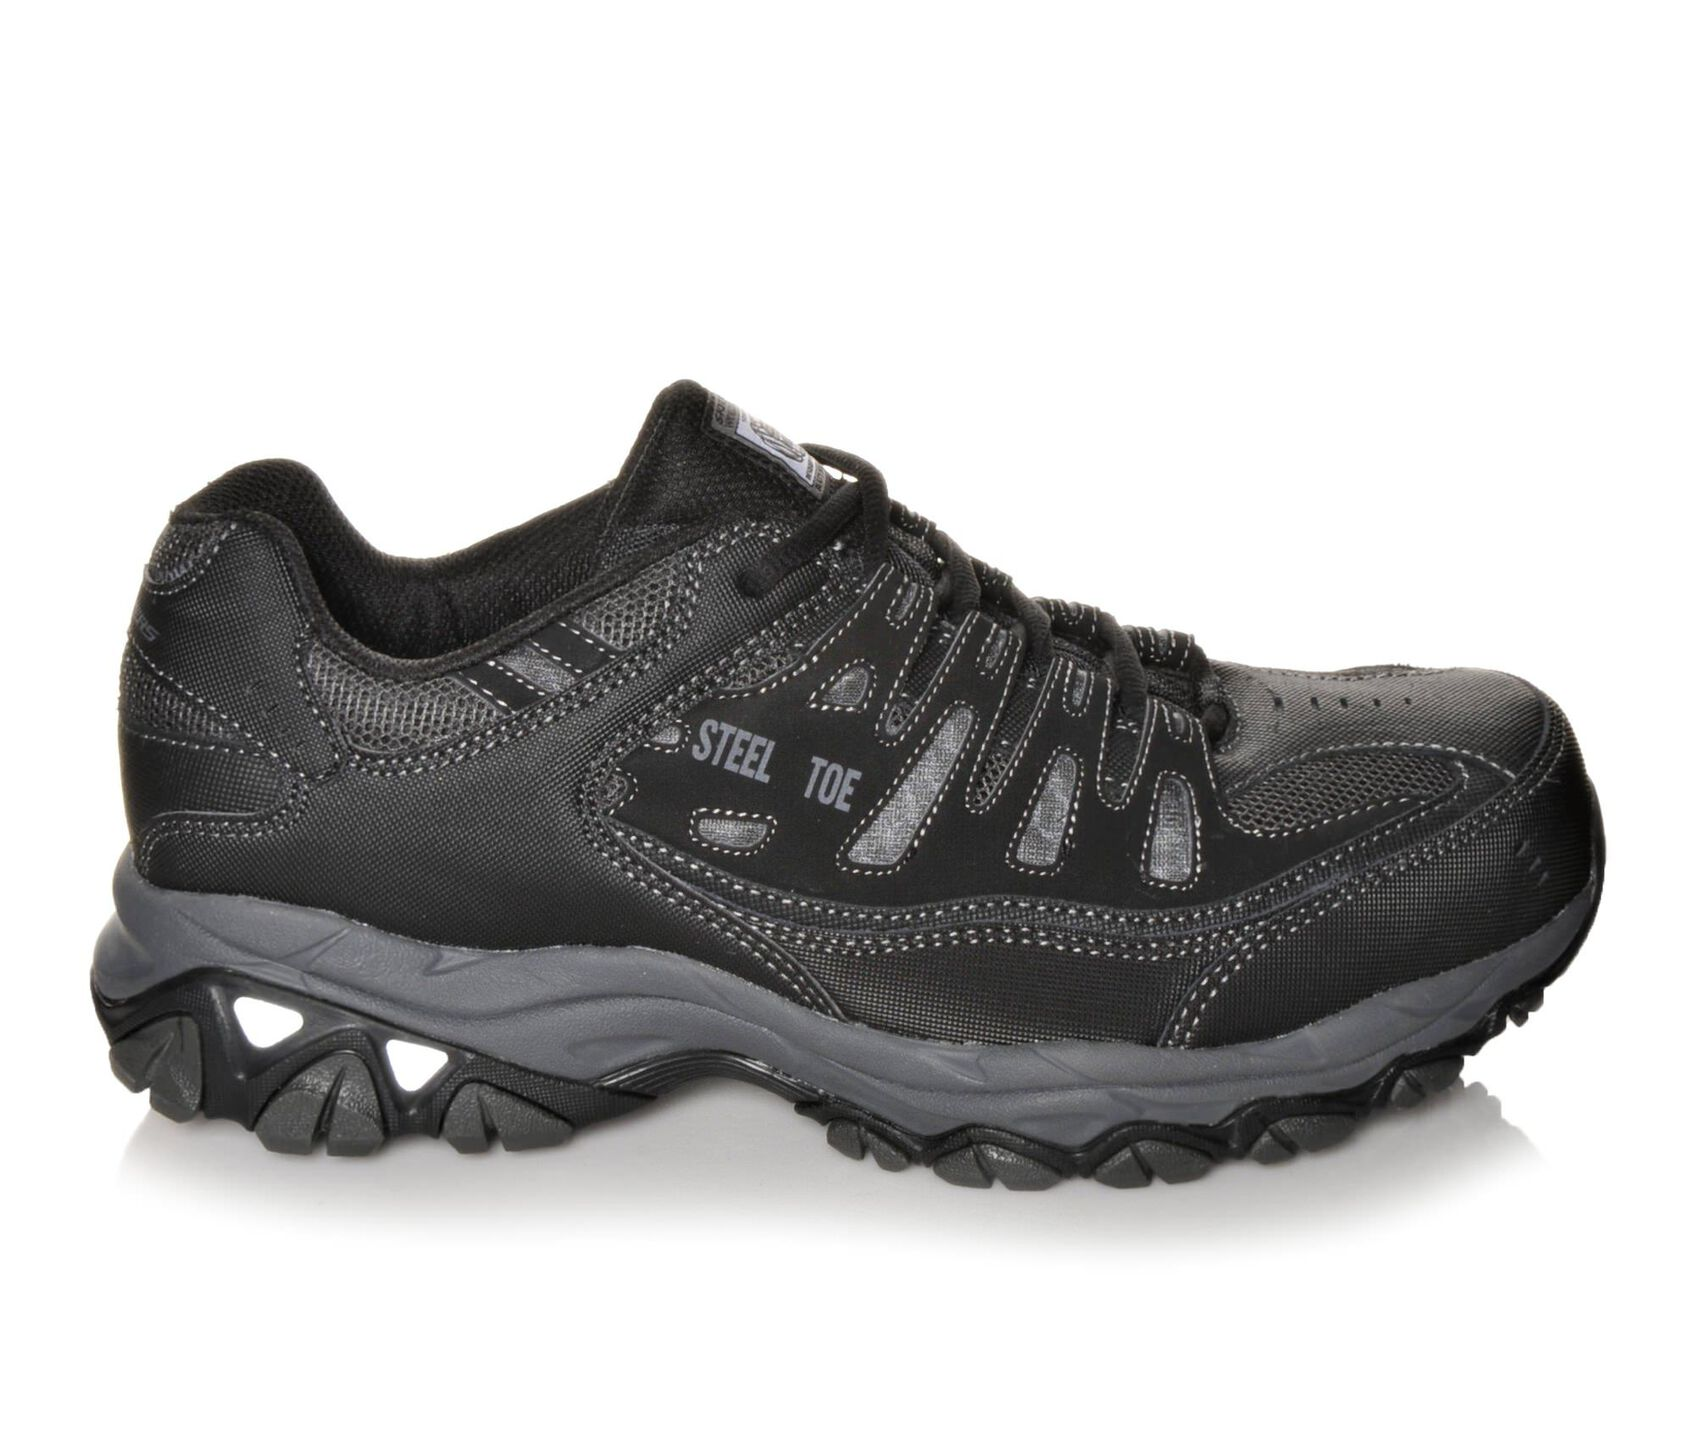 shoes men comfortable orthopedic vionic dress work s blog mens comforter wingtip roth most footnotes healthy